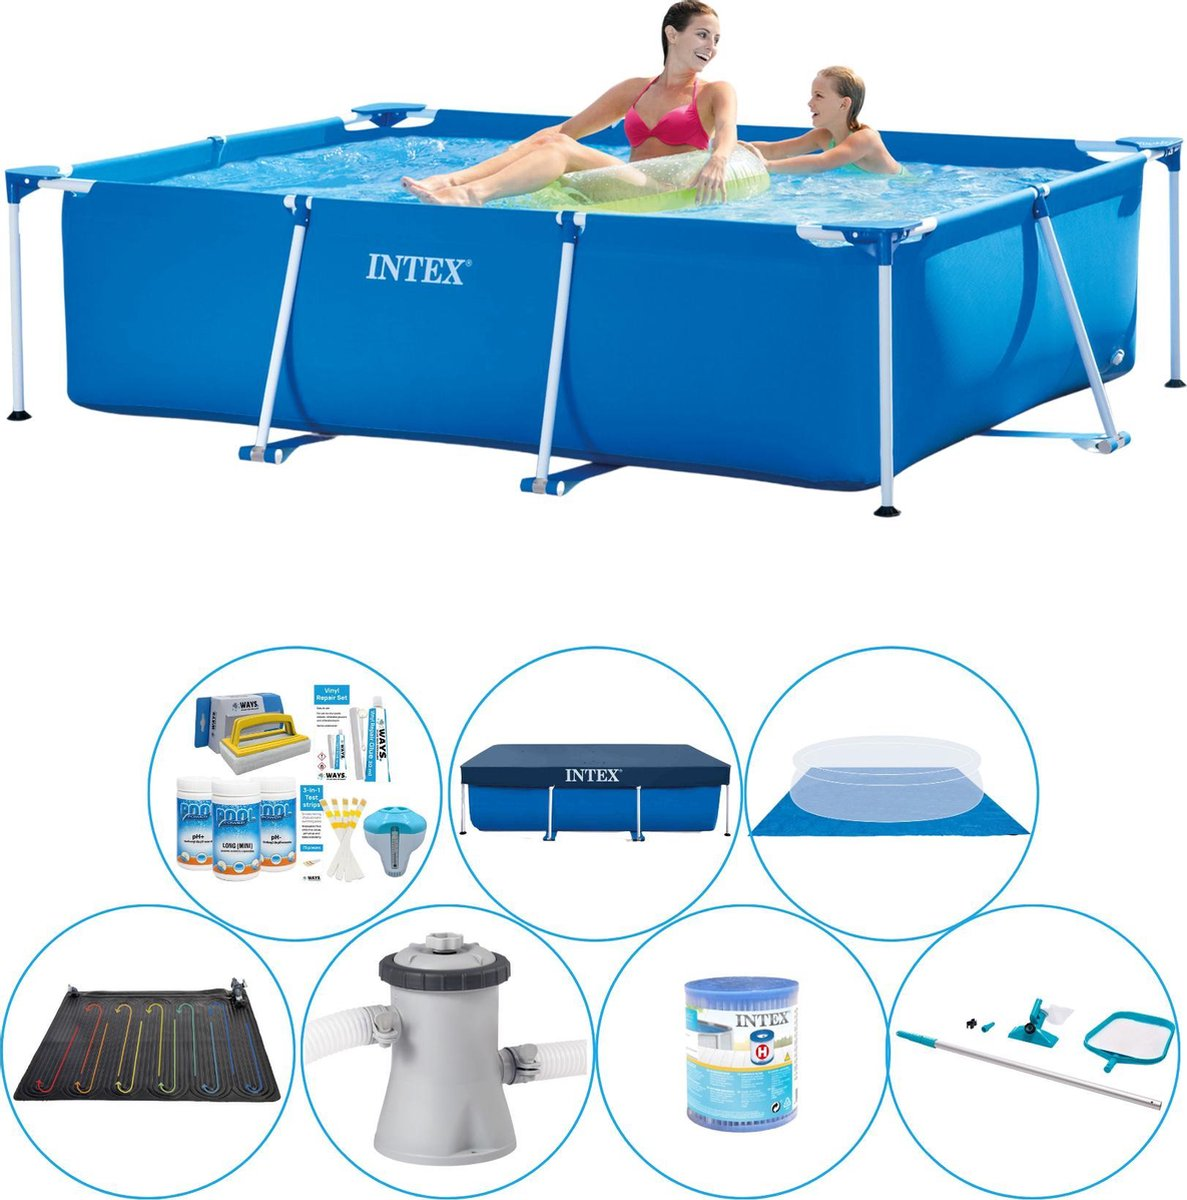 Intex Frame Pool Zwembad Super Deal - 220 x 150 x 60 cm